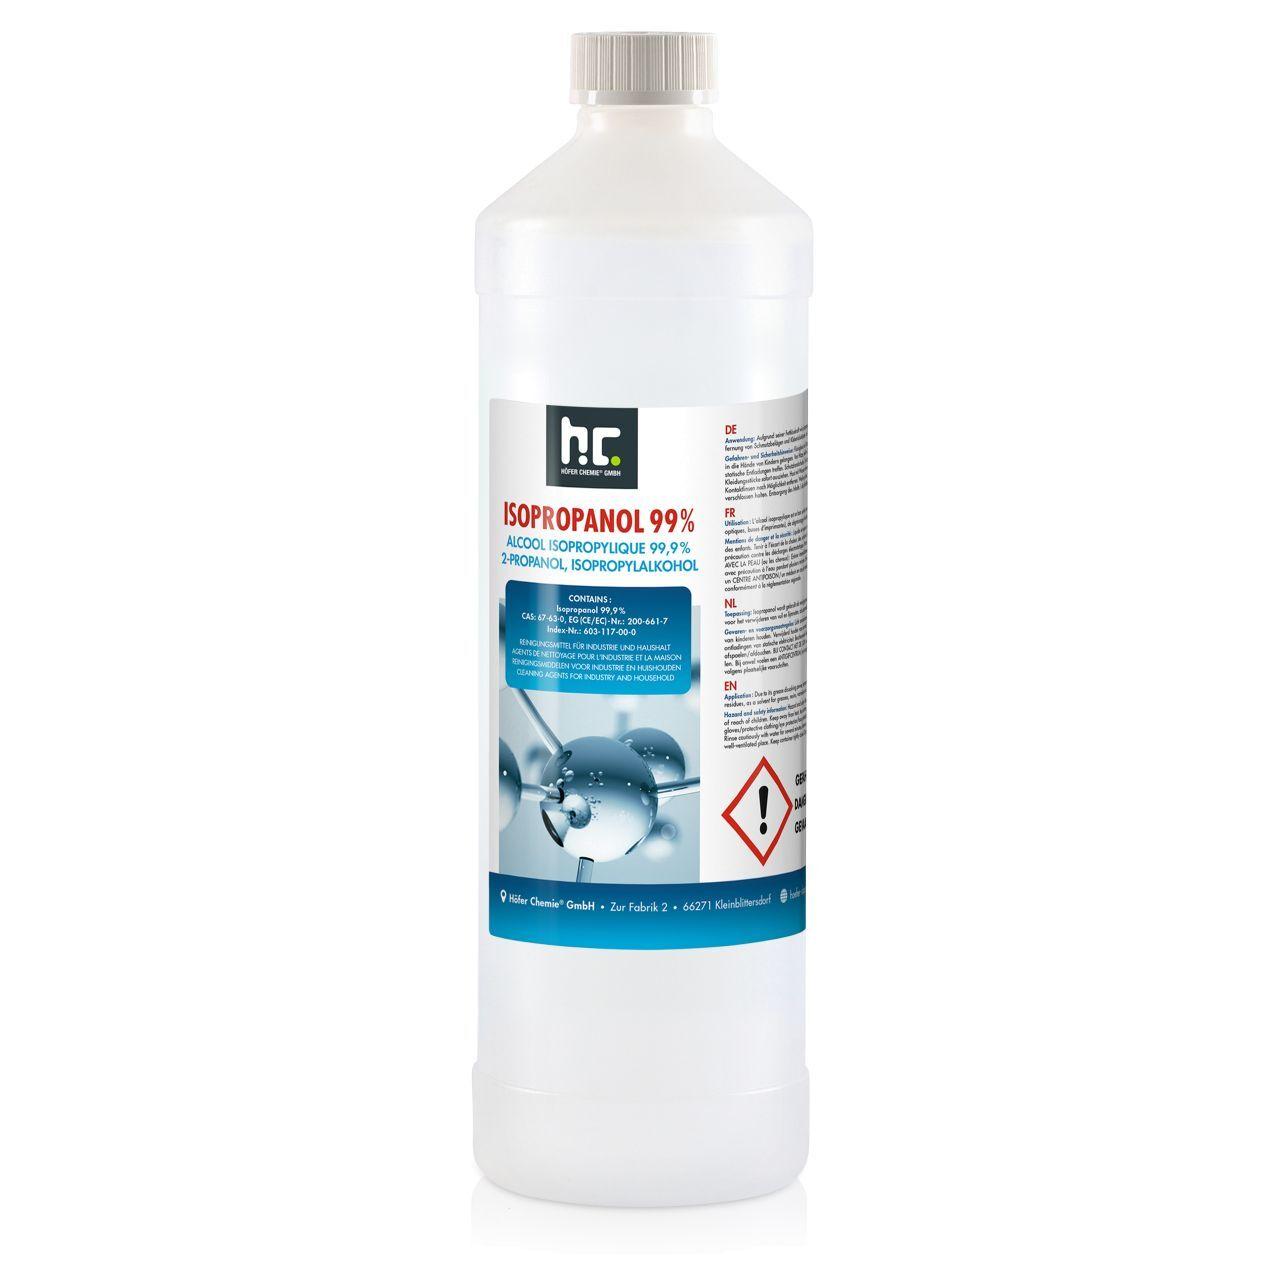 Höfer Chemie 1 l Alcool isopropylique 99,9 % (1 x 1 l)